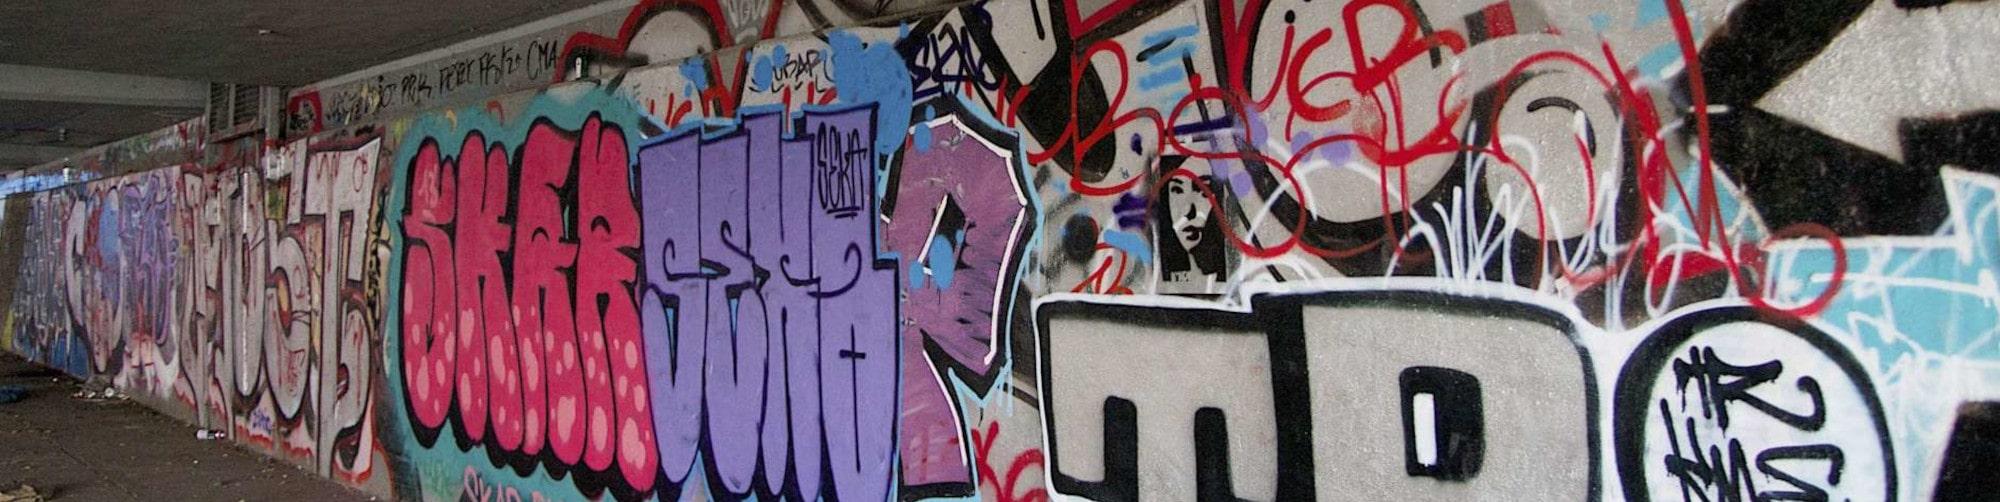 Grafittirens